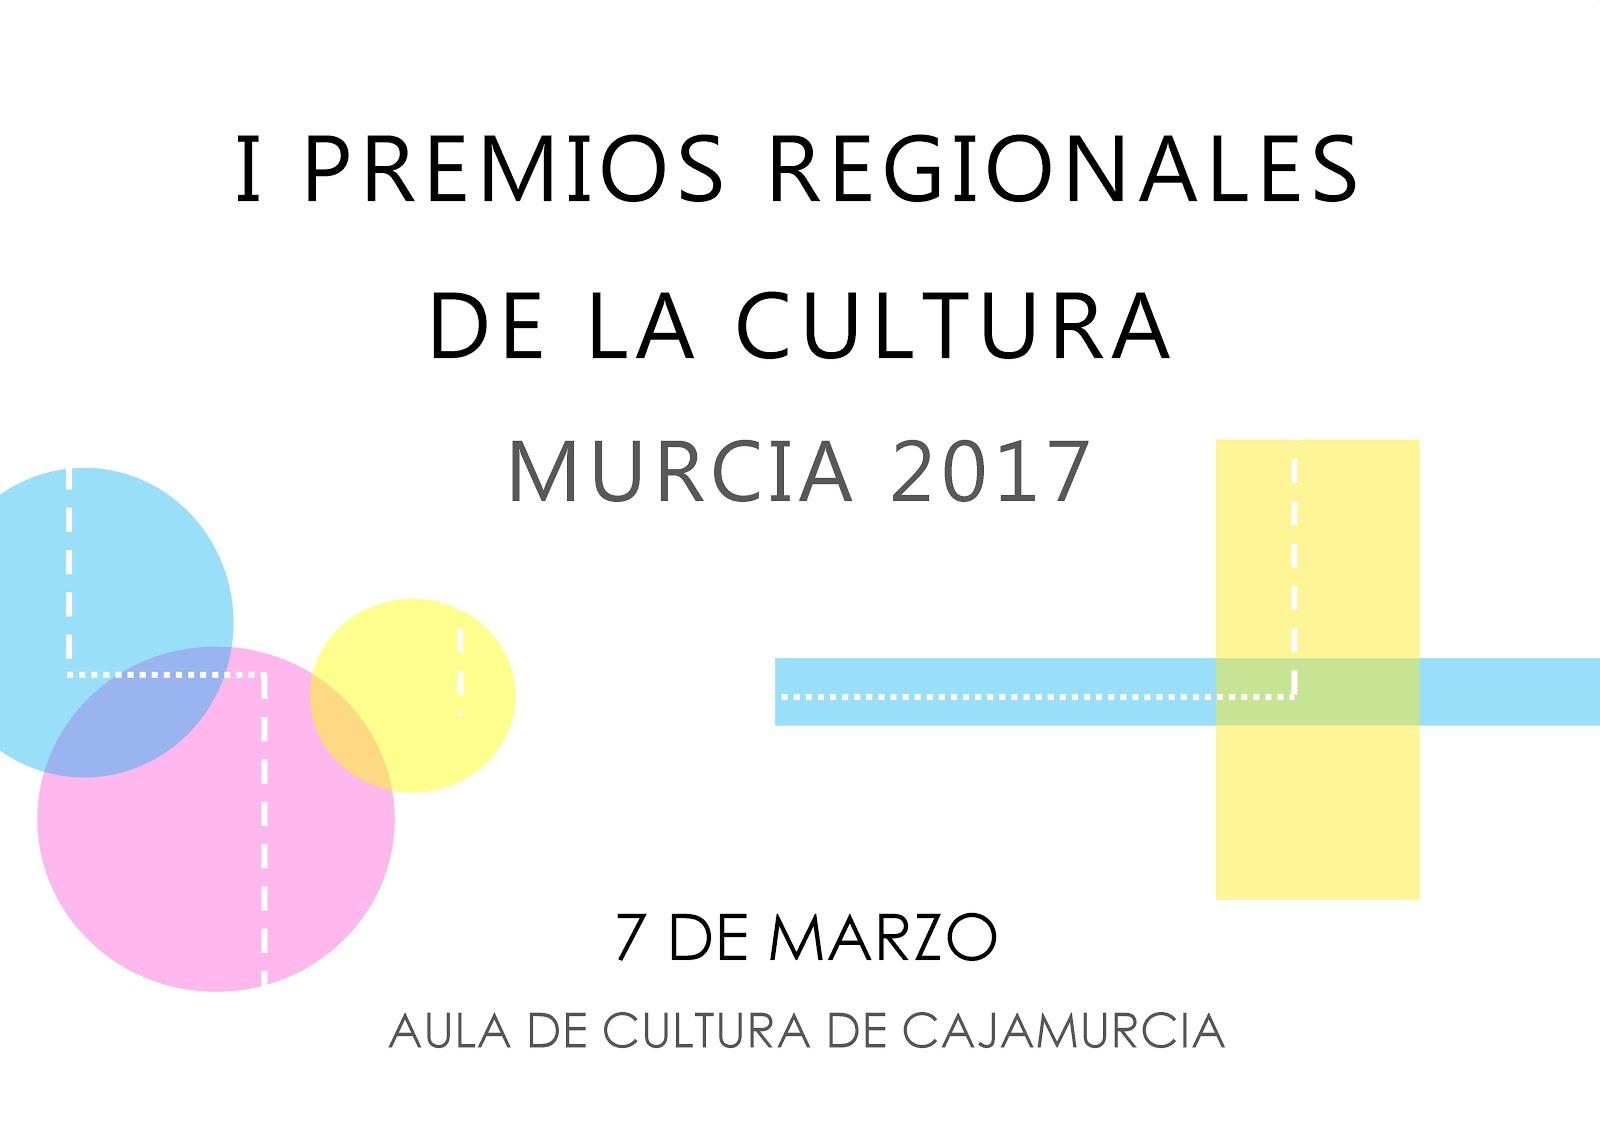 I Premios Regionales de la Cultura